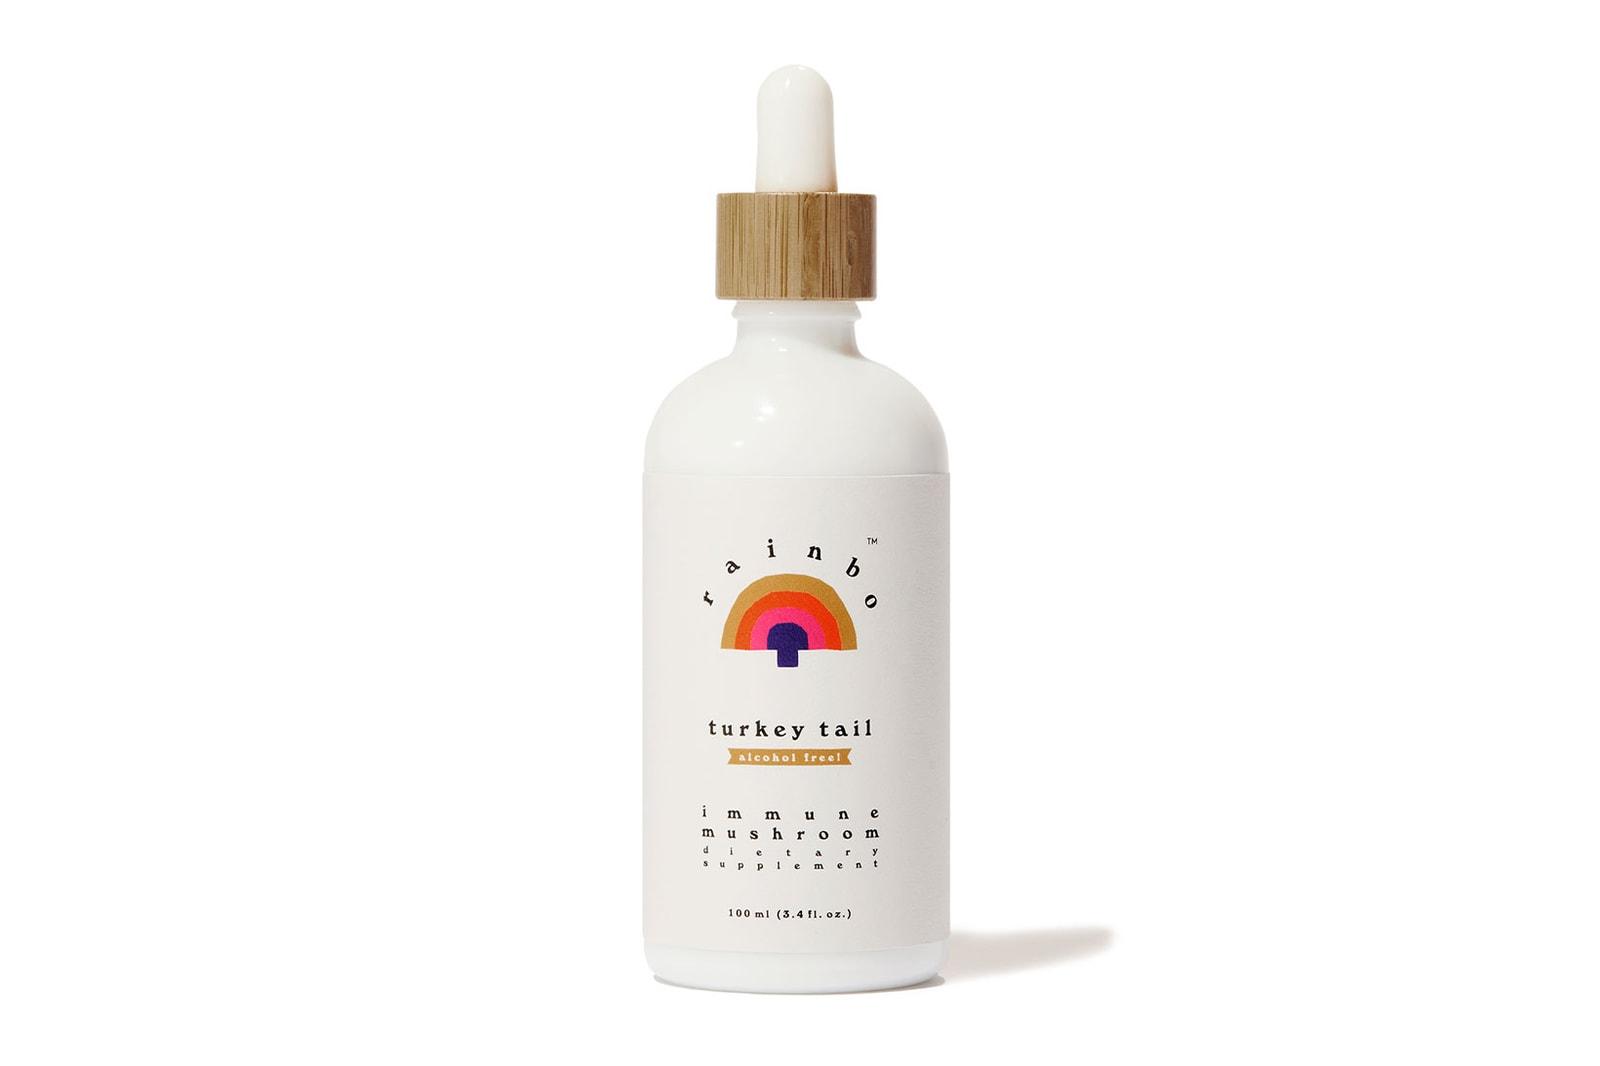 rainbo mushrooms spirit bear chaga turkey tail extract tincture wellness supplements powder where to buy